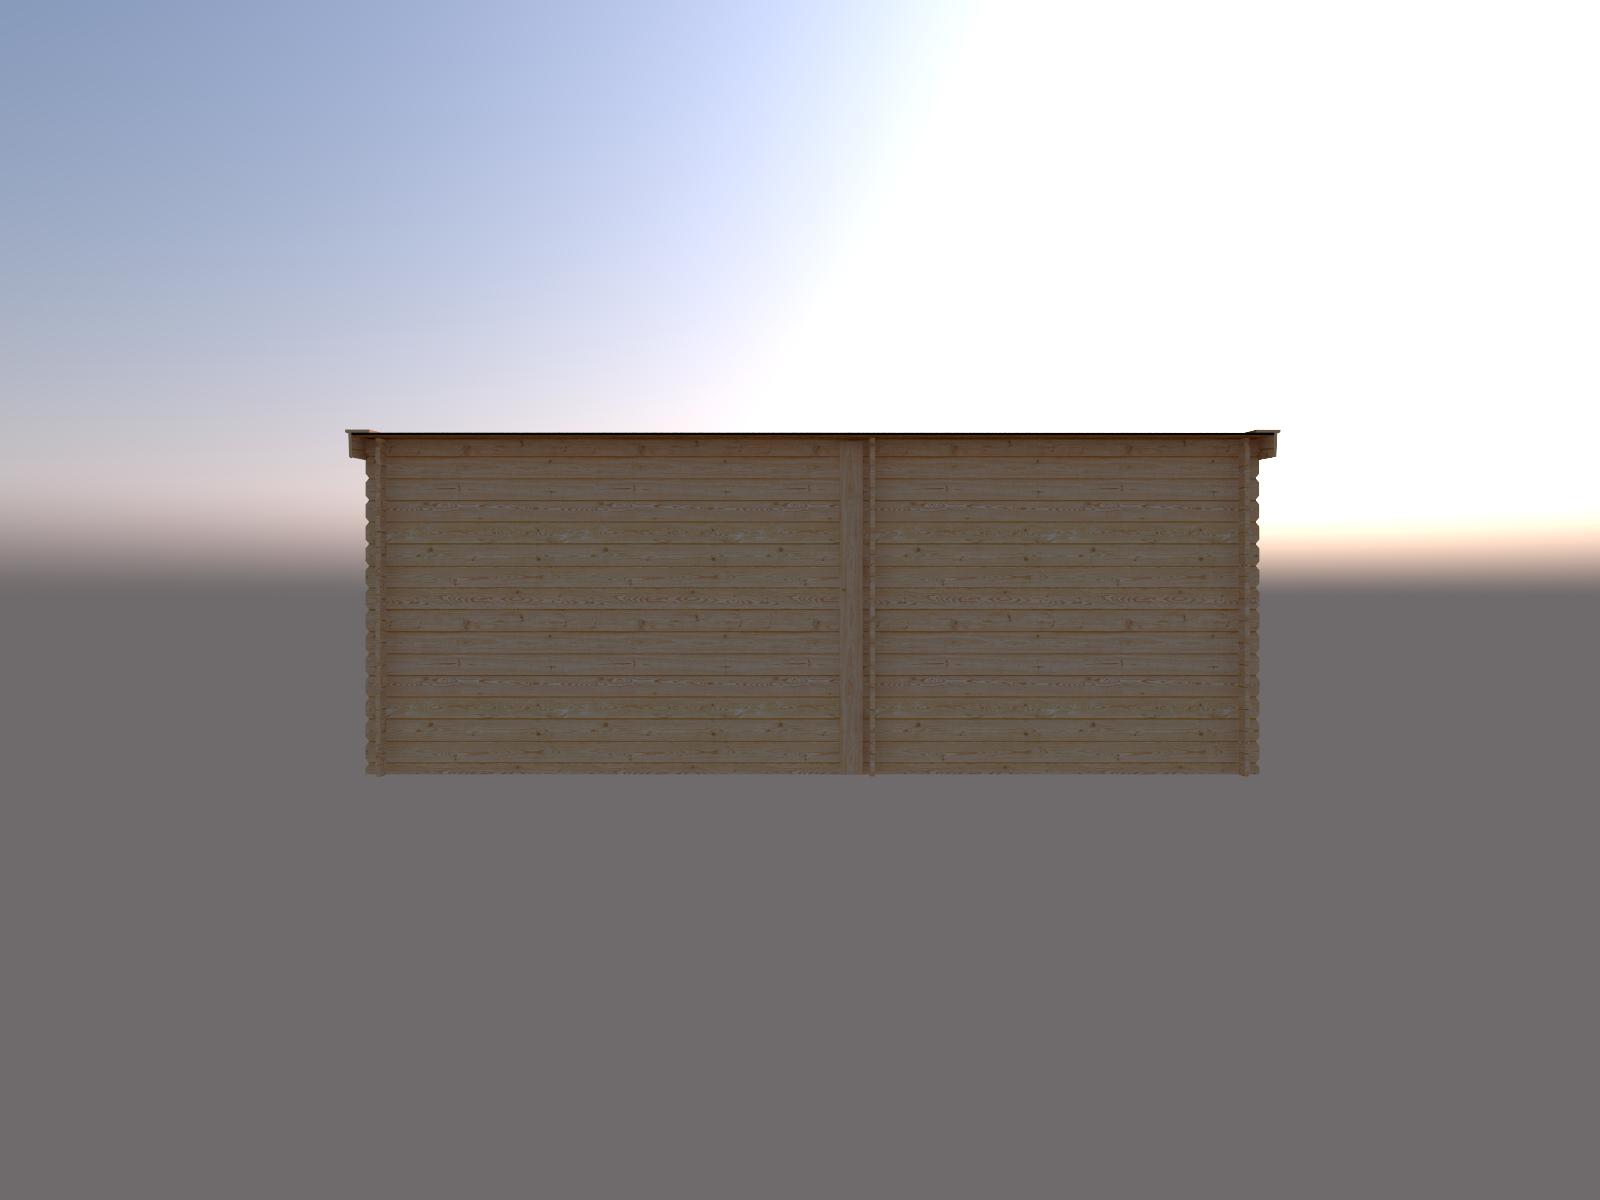 DWF Blokhut met overkapping lessenaar dak 250 x 200 + 300cm